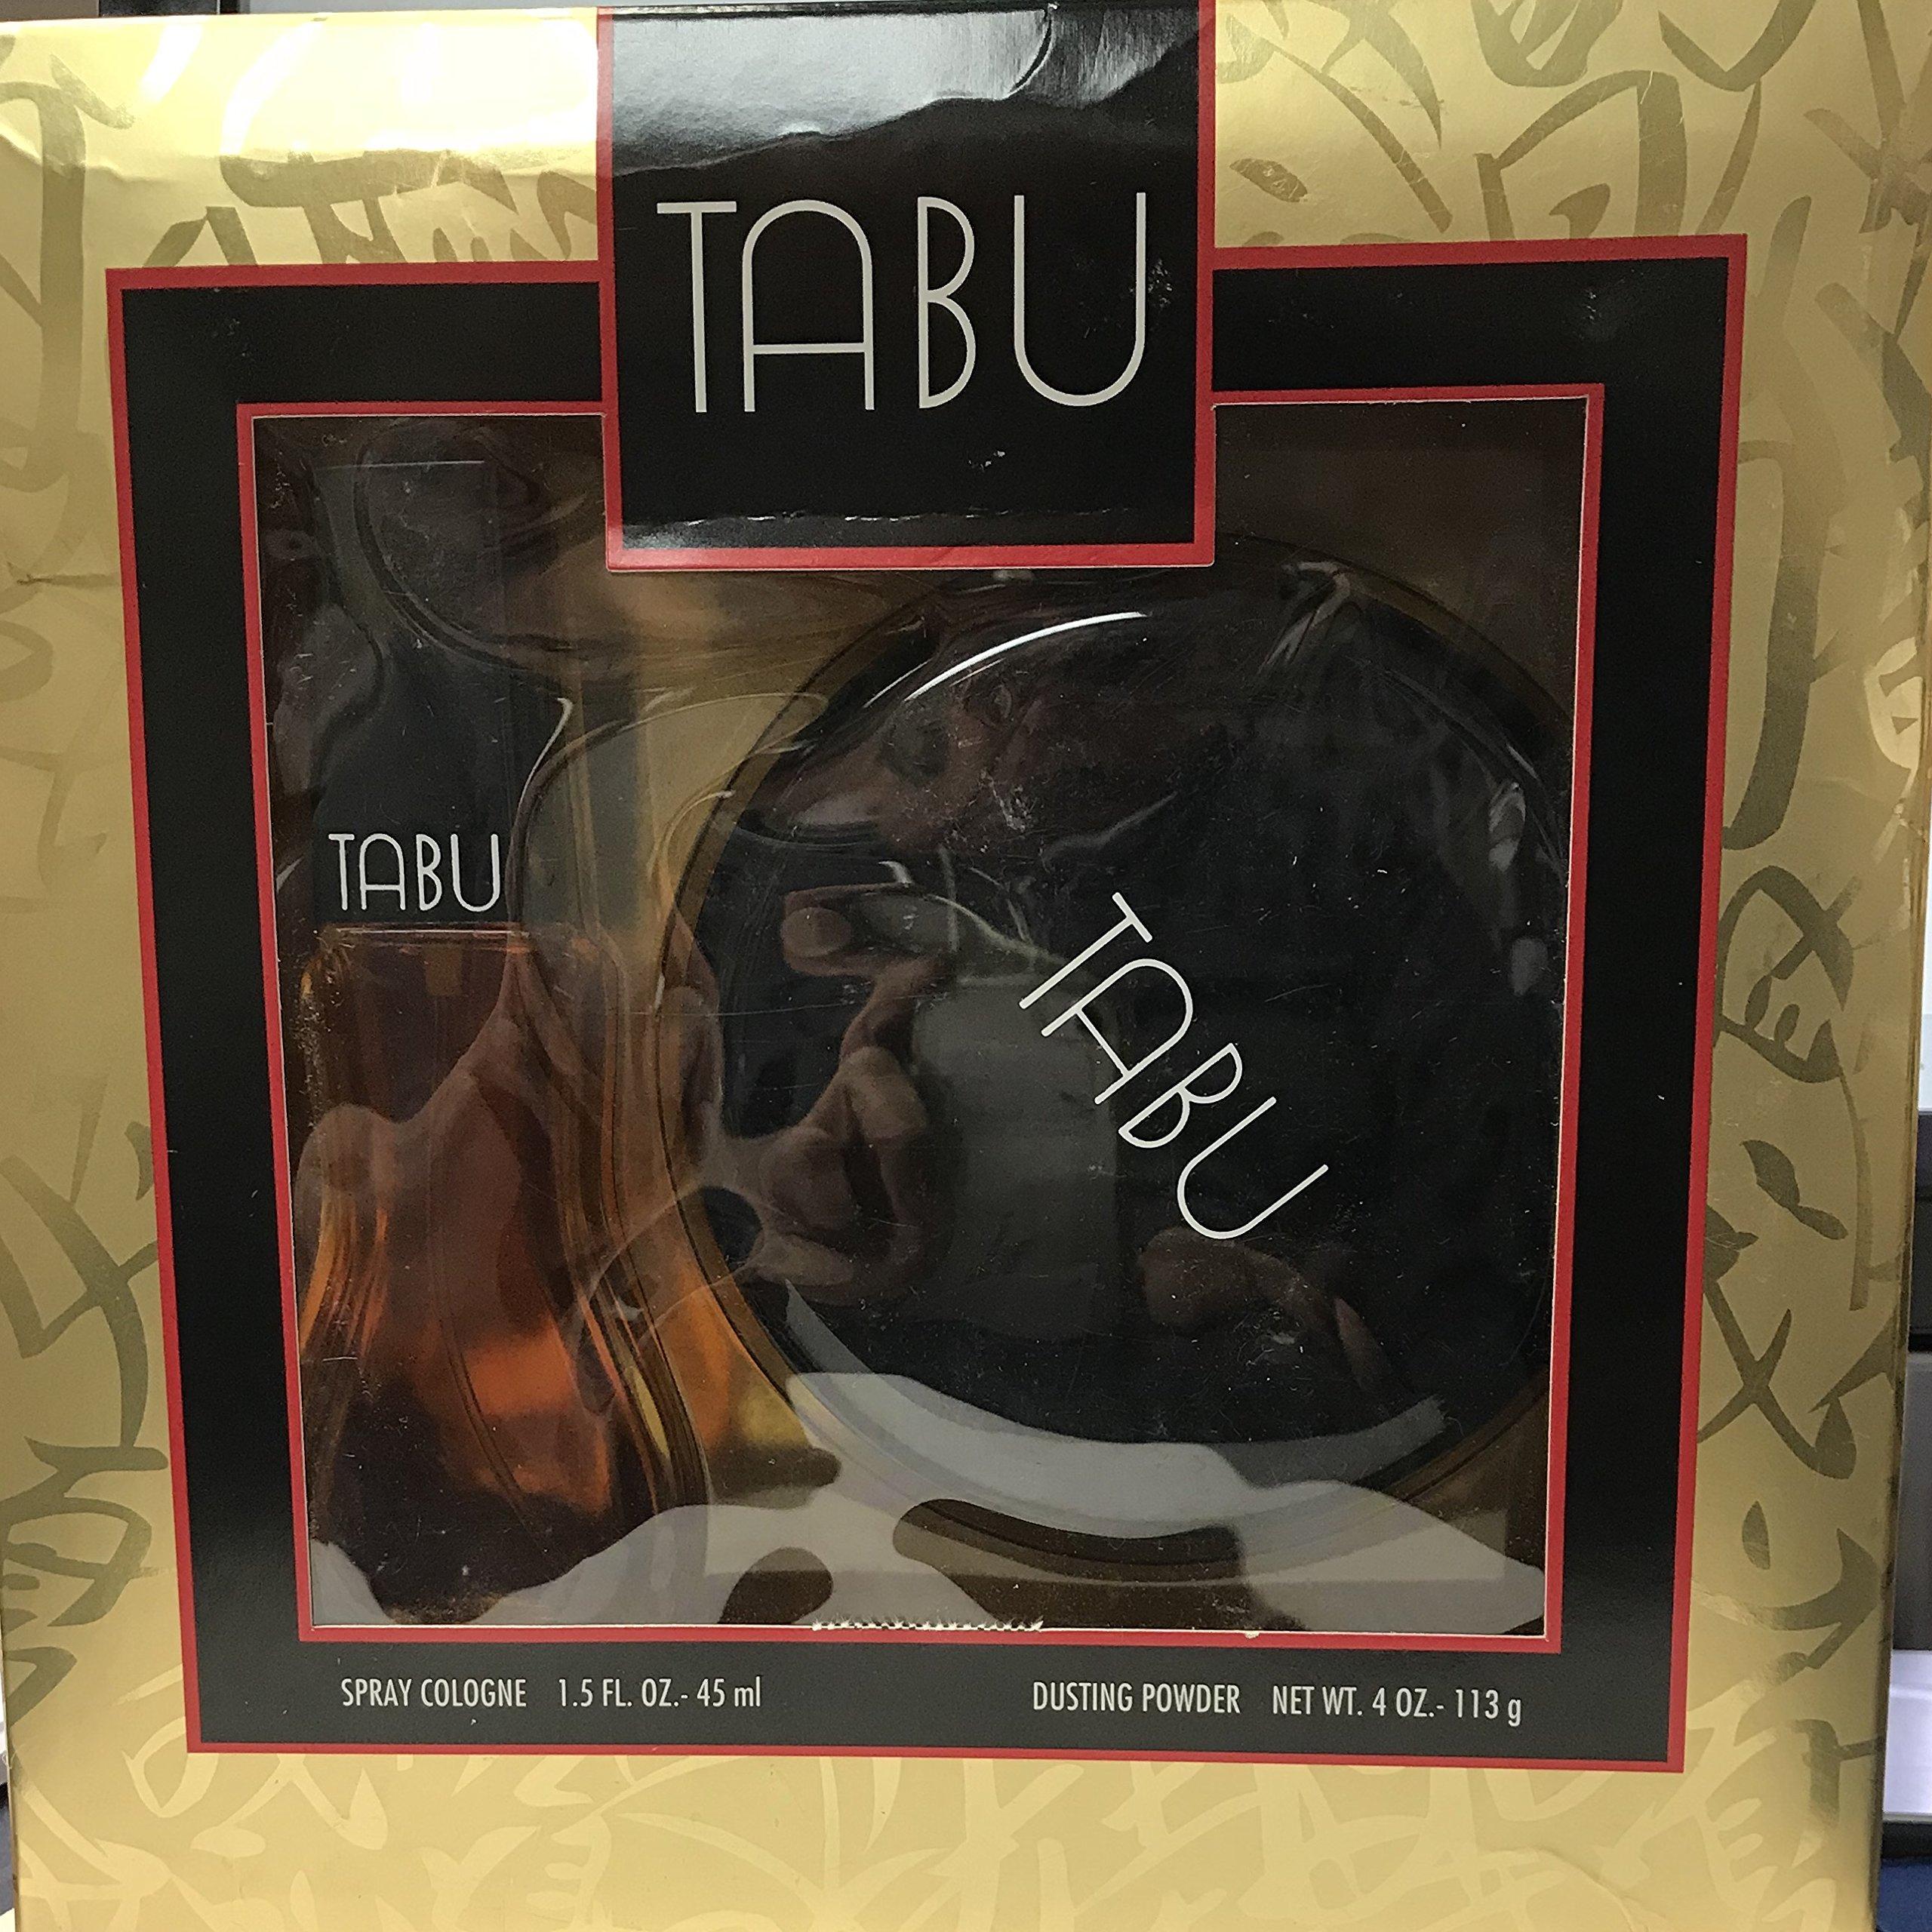 Tabu Spray Cologne 1.5 fl oz 45 ml / Dusting Powder 4 oz , 113 g set